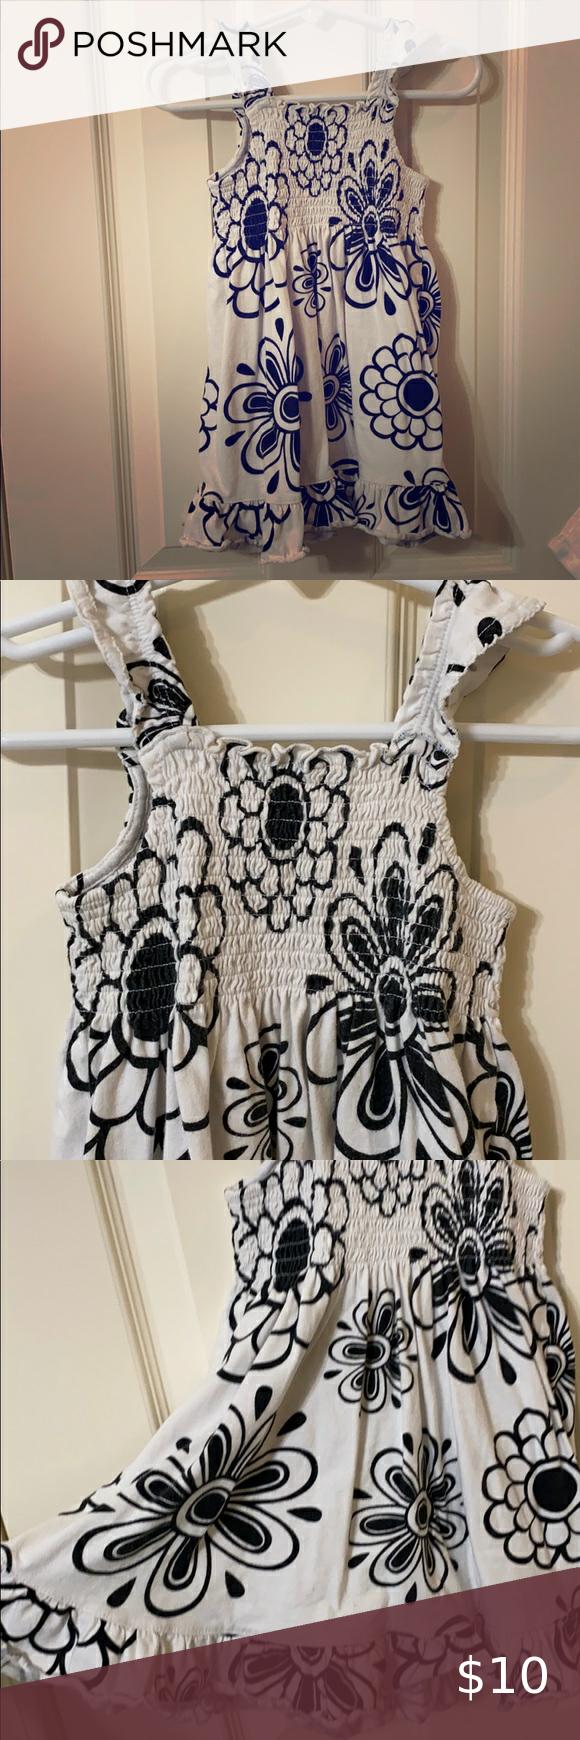 Toddler Seersucker Black And White Dress Cute Flower Print Black And White Dress With Ruffle Sleeves 2t B Black N White Dress Dresses Dress With Ruffle Sleeves [ 1740 x 580 Pixel ]